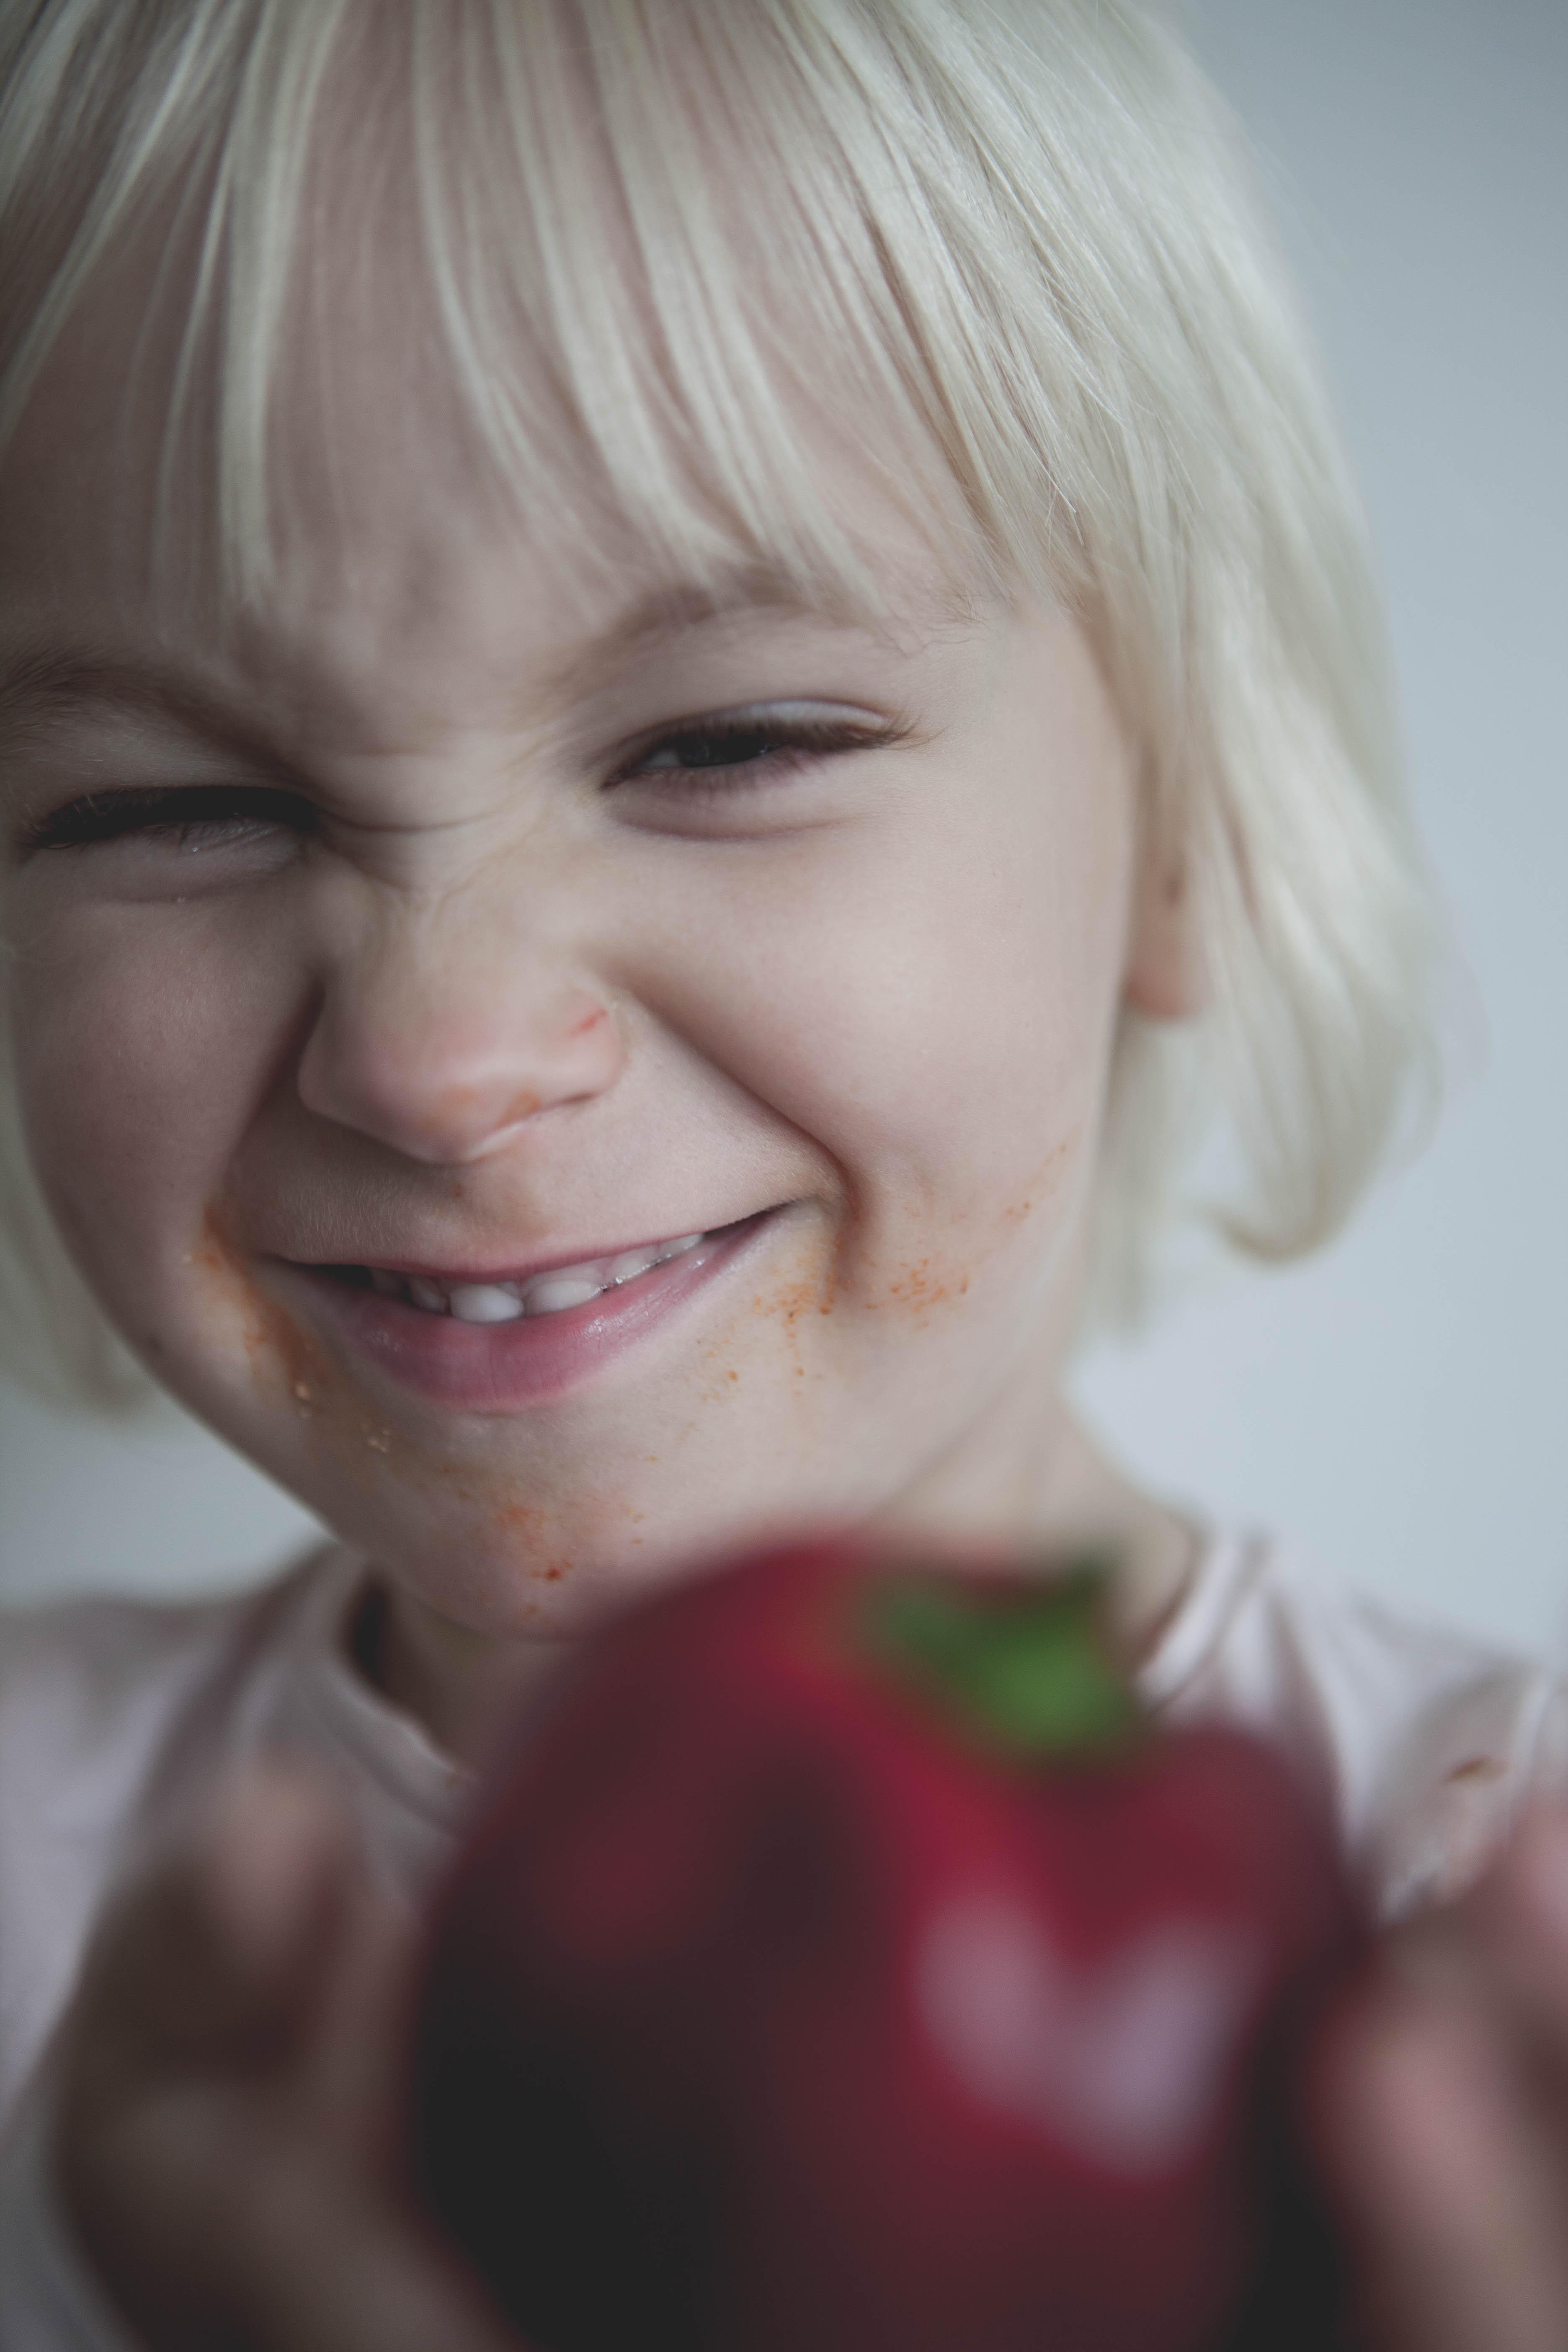 barn som håller i en paprika